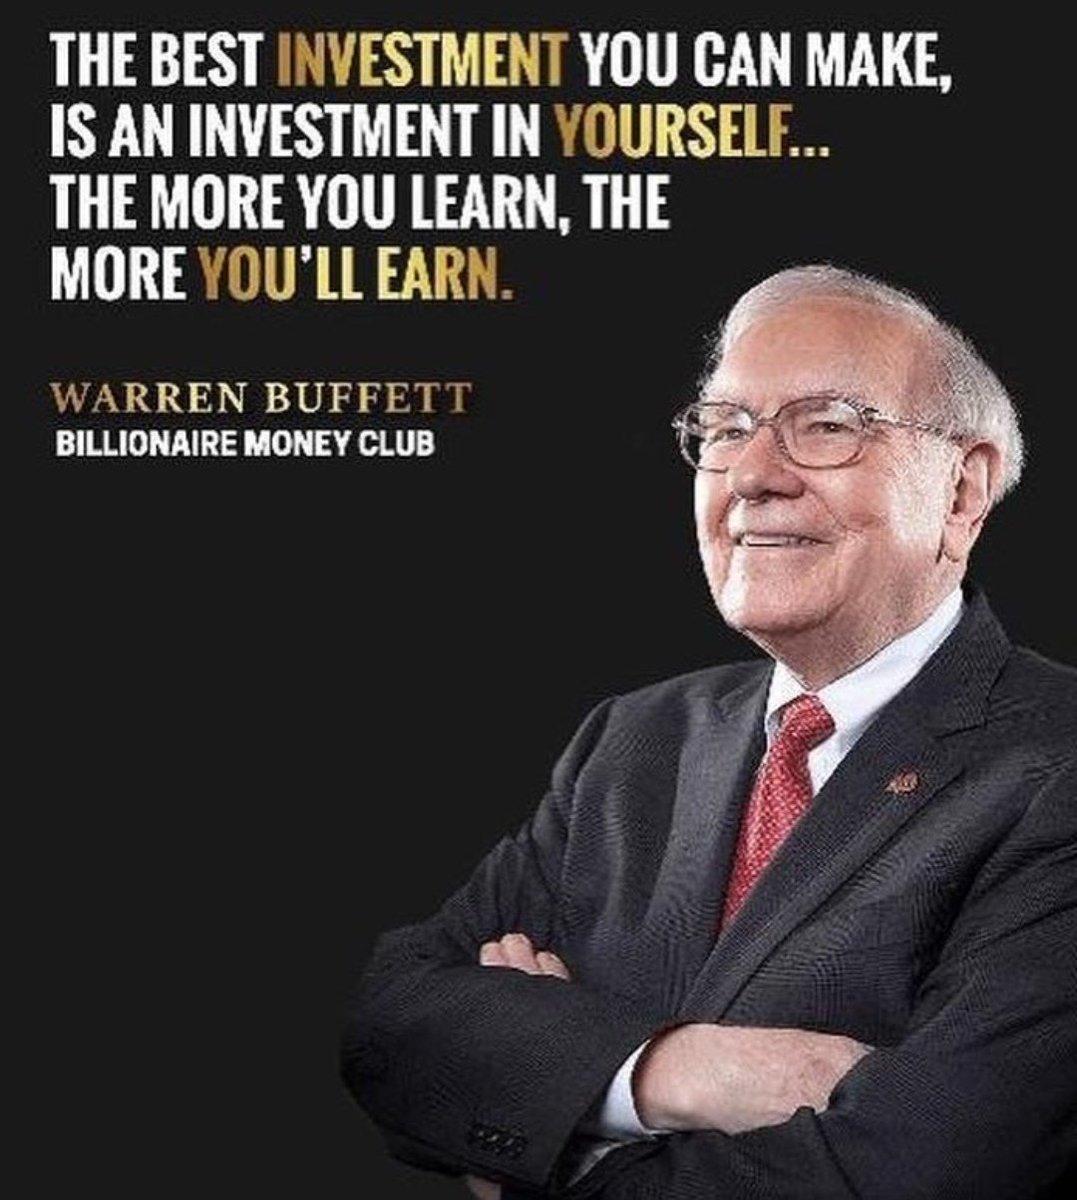 Keep On Learning and Exploring! ---------------------------------------------------- #BuildYourOwnFuture #Education #SuccessTrain #JoyTrain #5Dvibes